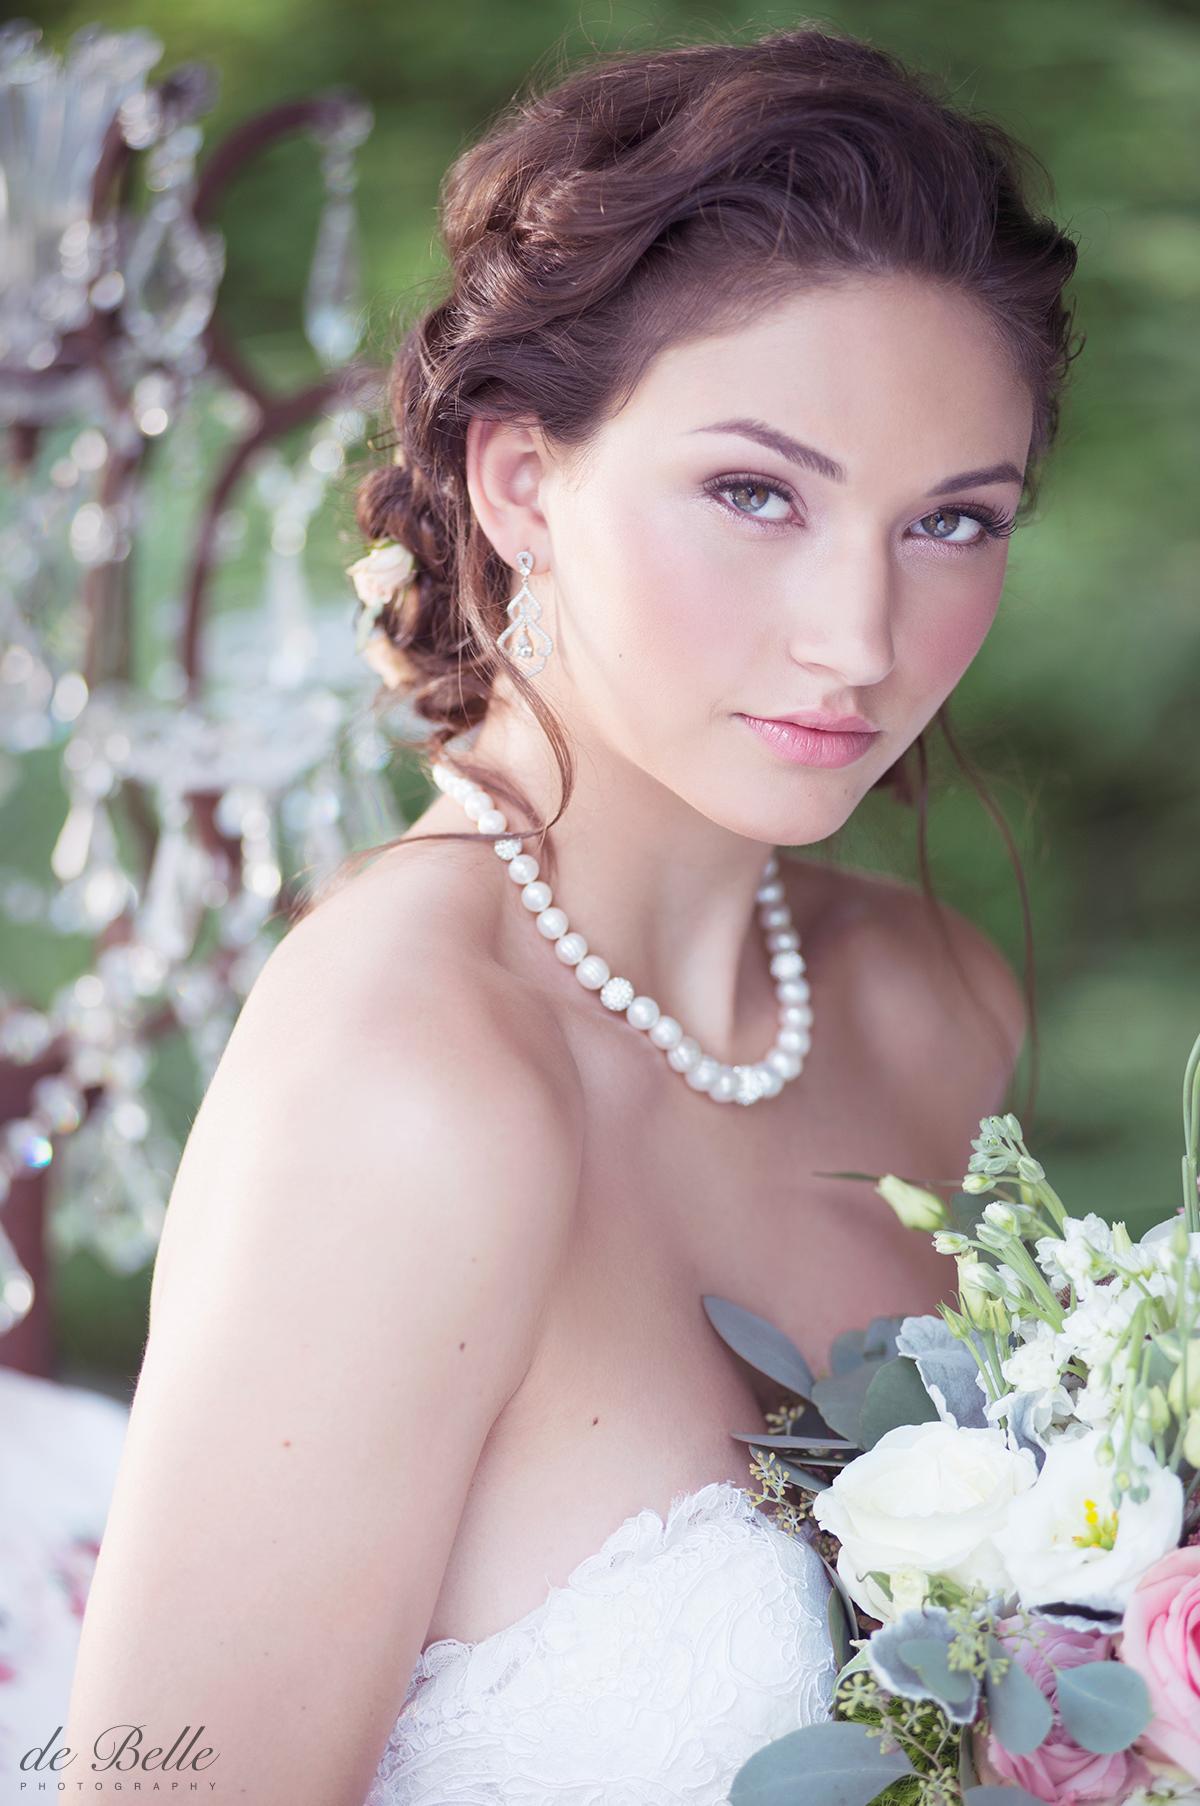 Montreal-Wedding-Photographer-Debelle-EW3